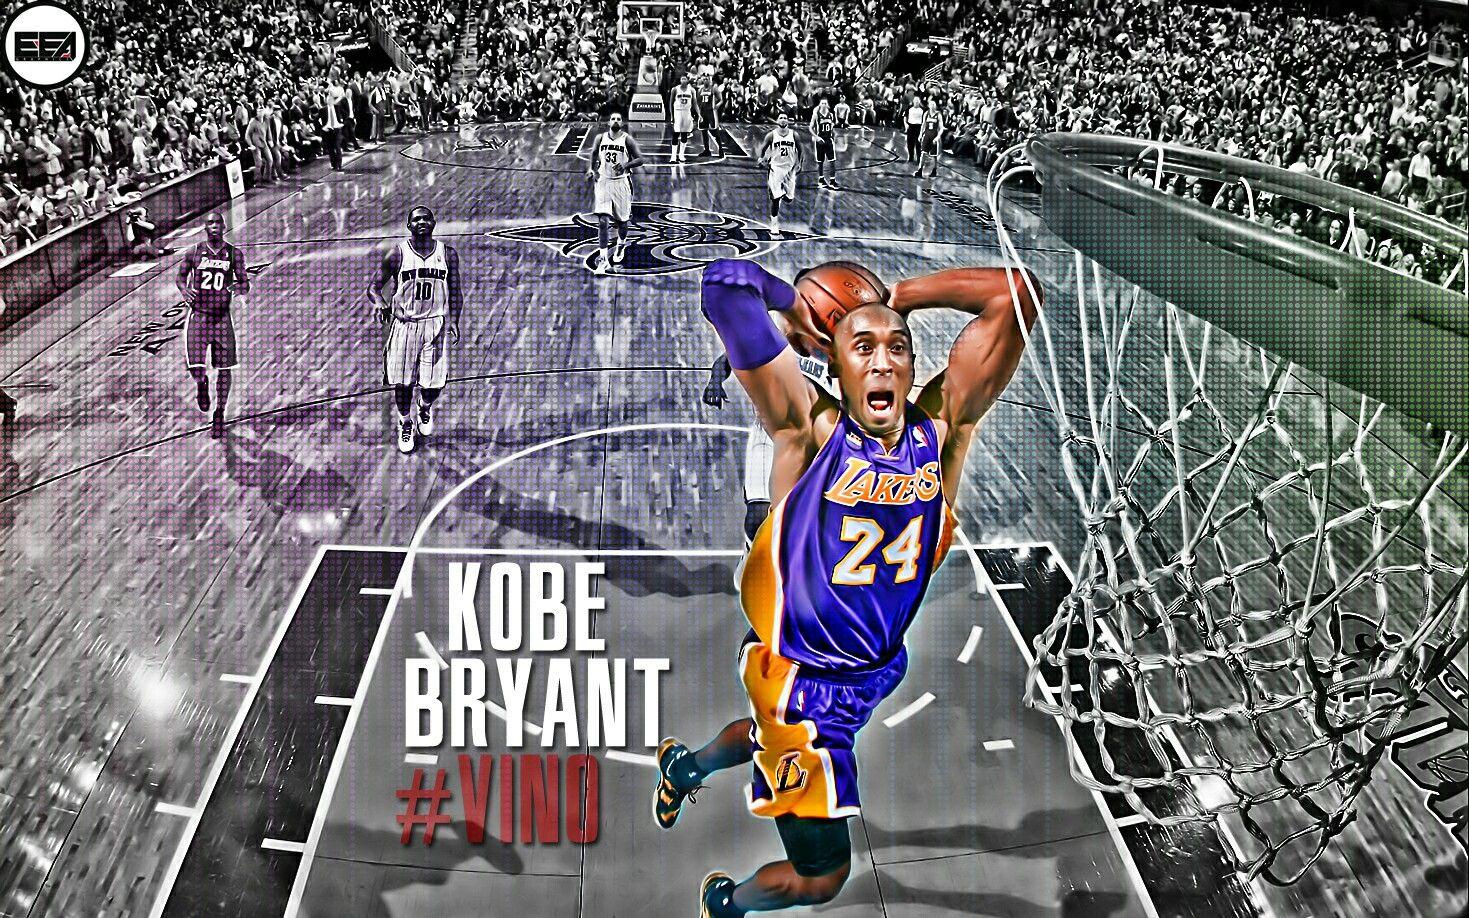 Pin by Markie Mark on Los Angels Lakers Kobe bryant